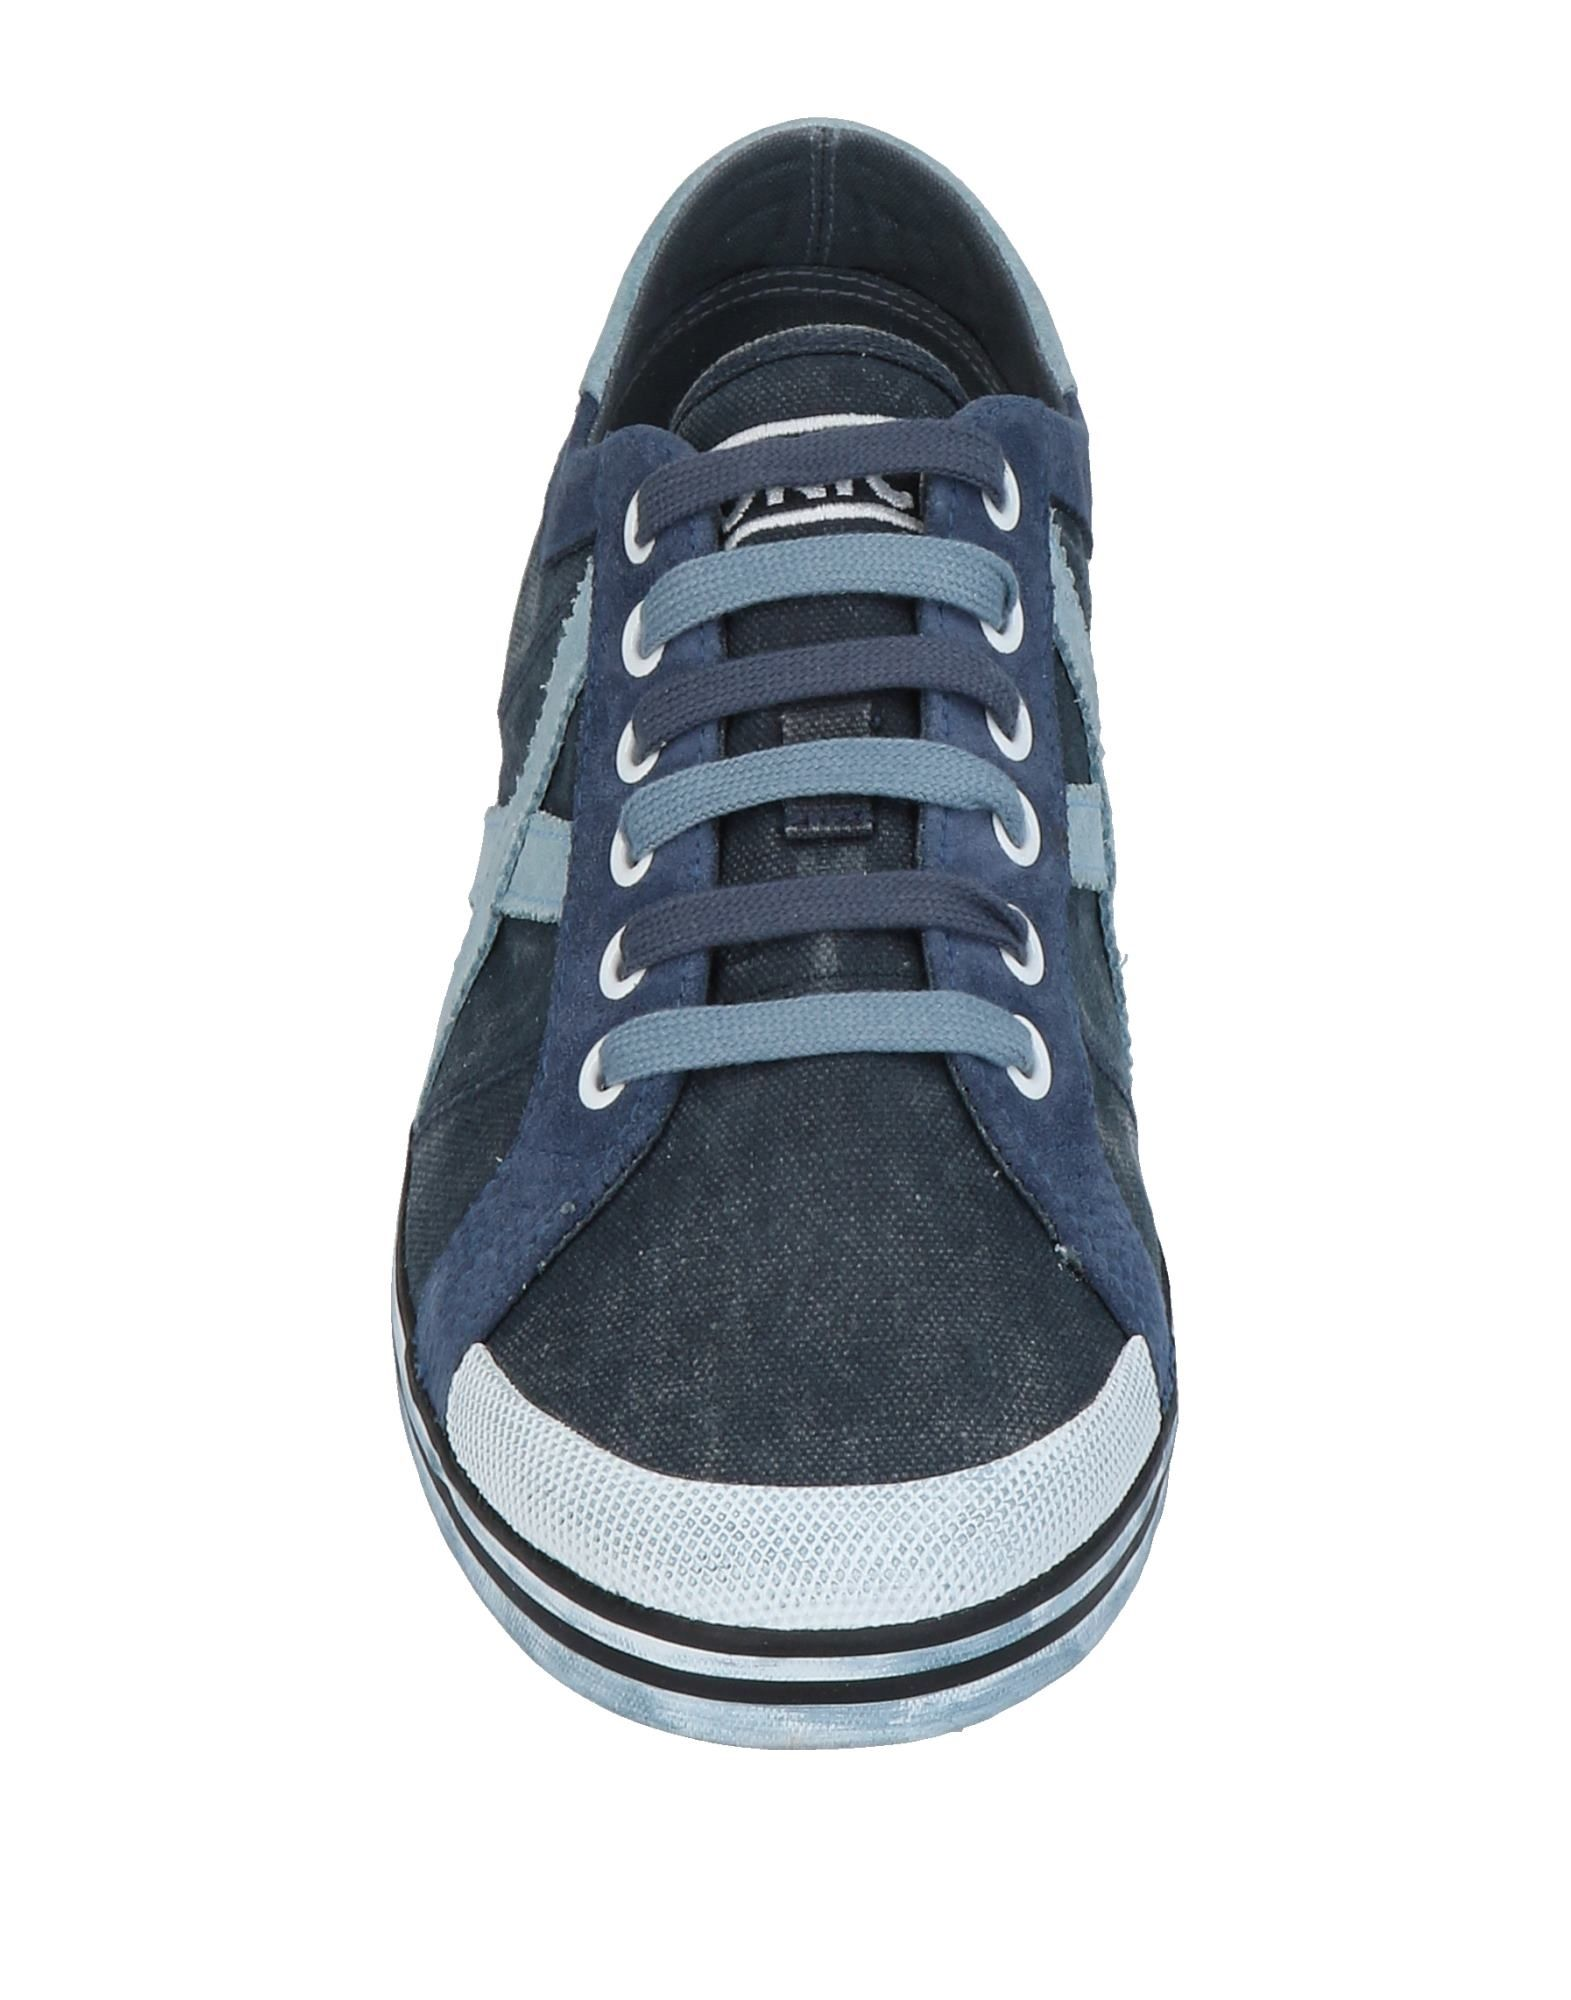 Rabatt echte Sneakers Schuhe Munich Sneakers echte Herren  11454642GR 79892e